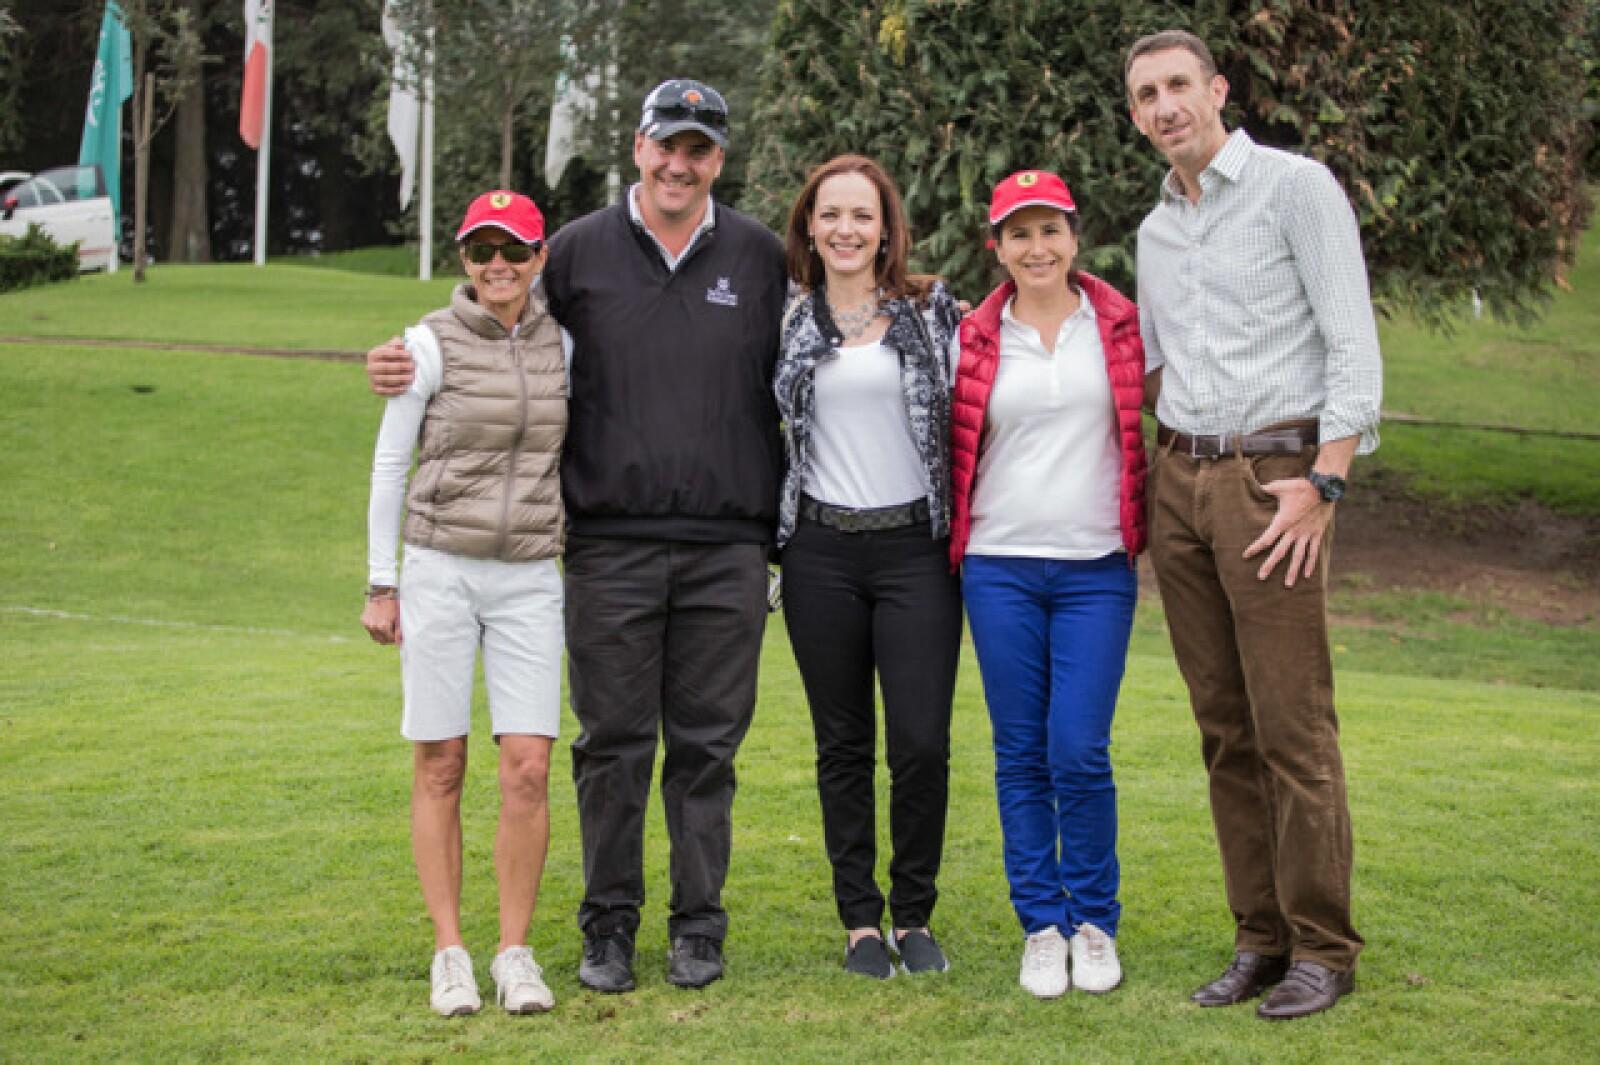 Mónica Hernández, Alejandro Padilla, Alida Padilla, Gloria Borges y Marco Cannizzo